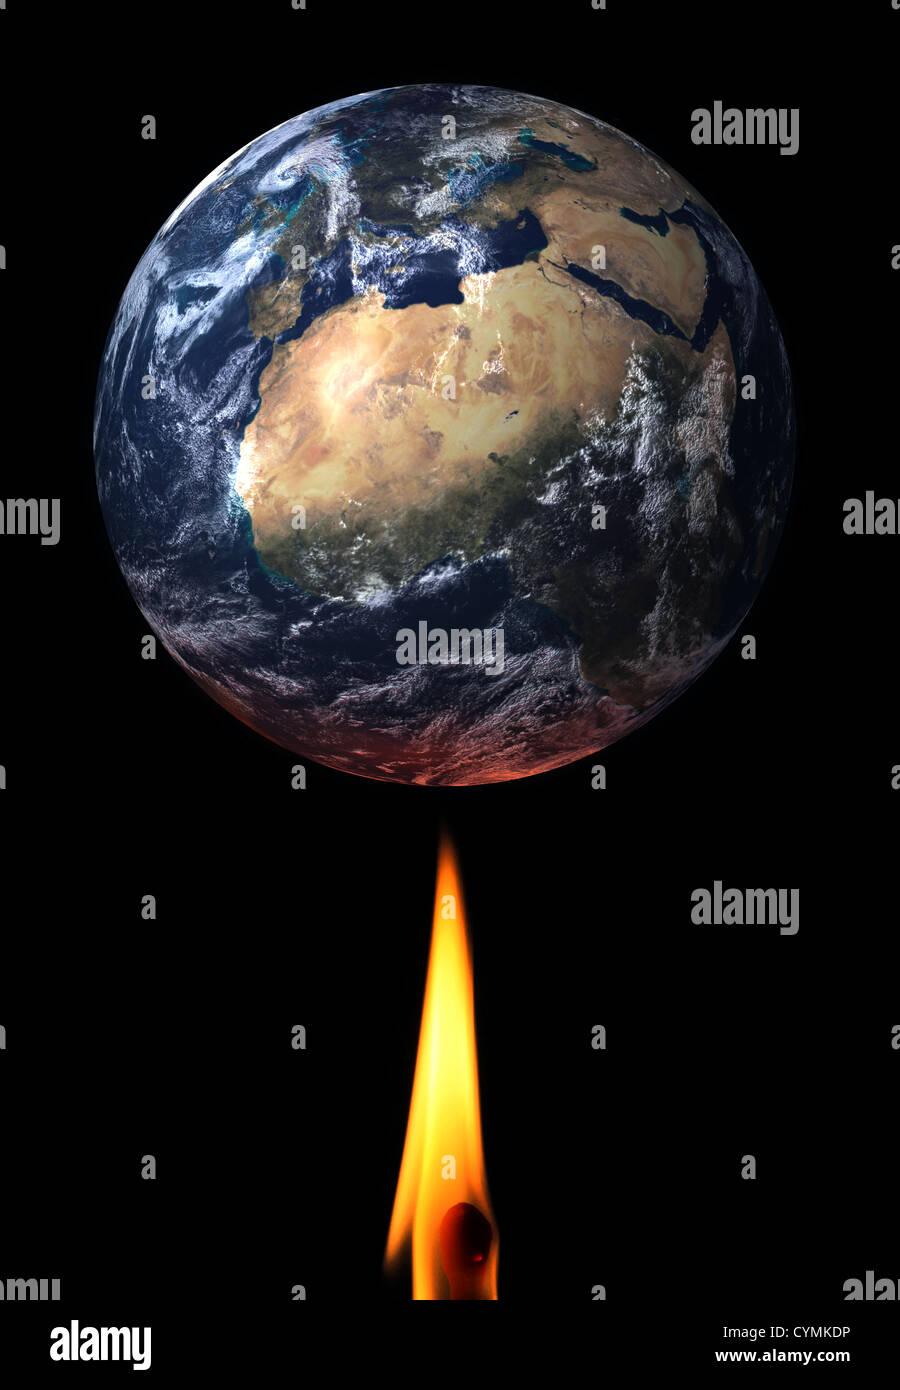 Global Warming theme image/illustration. - Stock Image